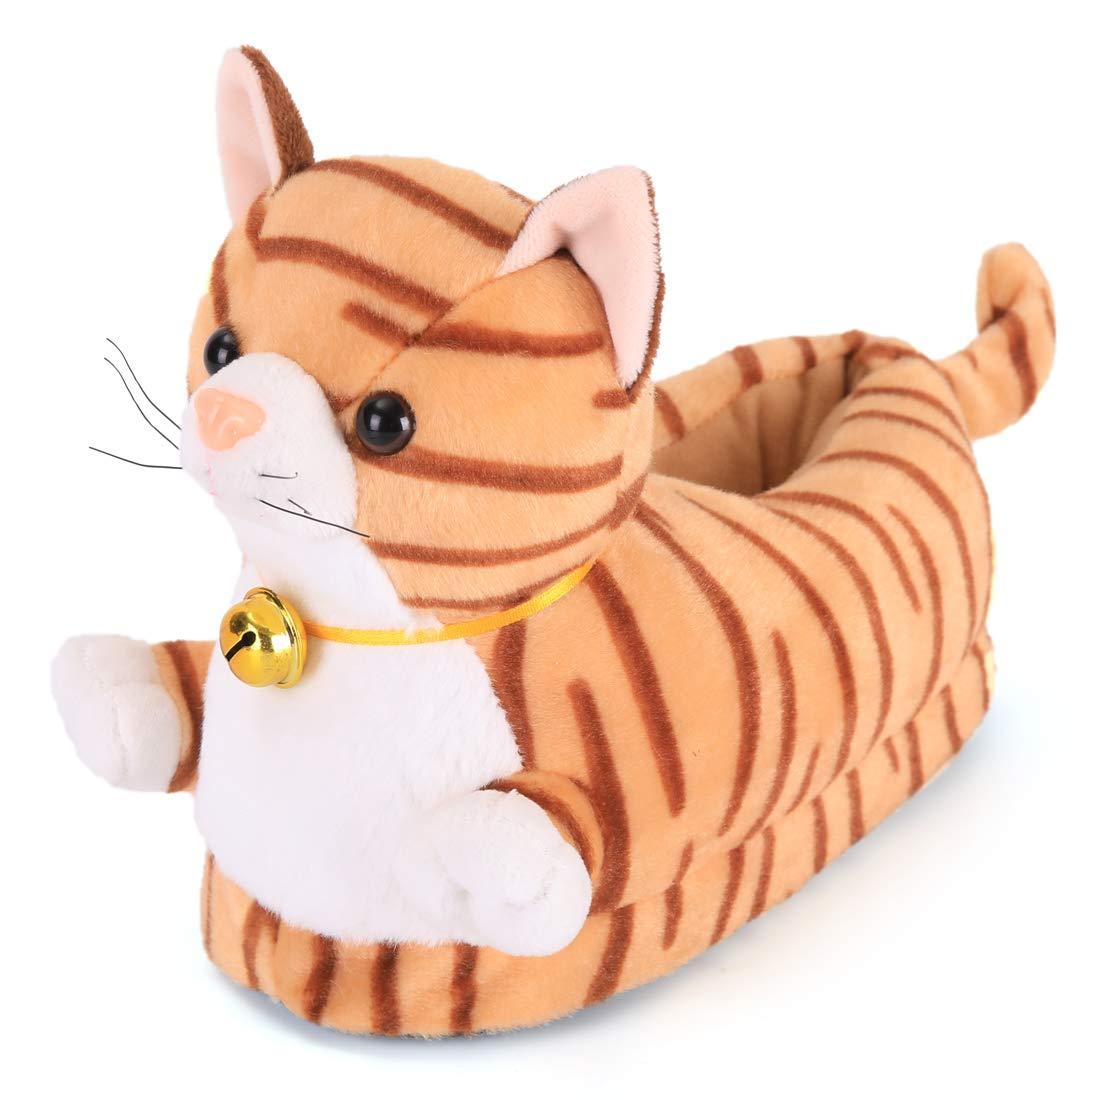 Sunnyday Toy Shoes Cute /& Soft Plush Slipper Novelty Cat Animal with Antiskid Foam Bottom